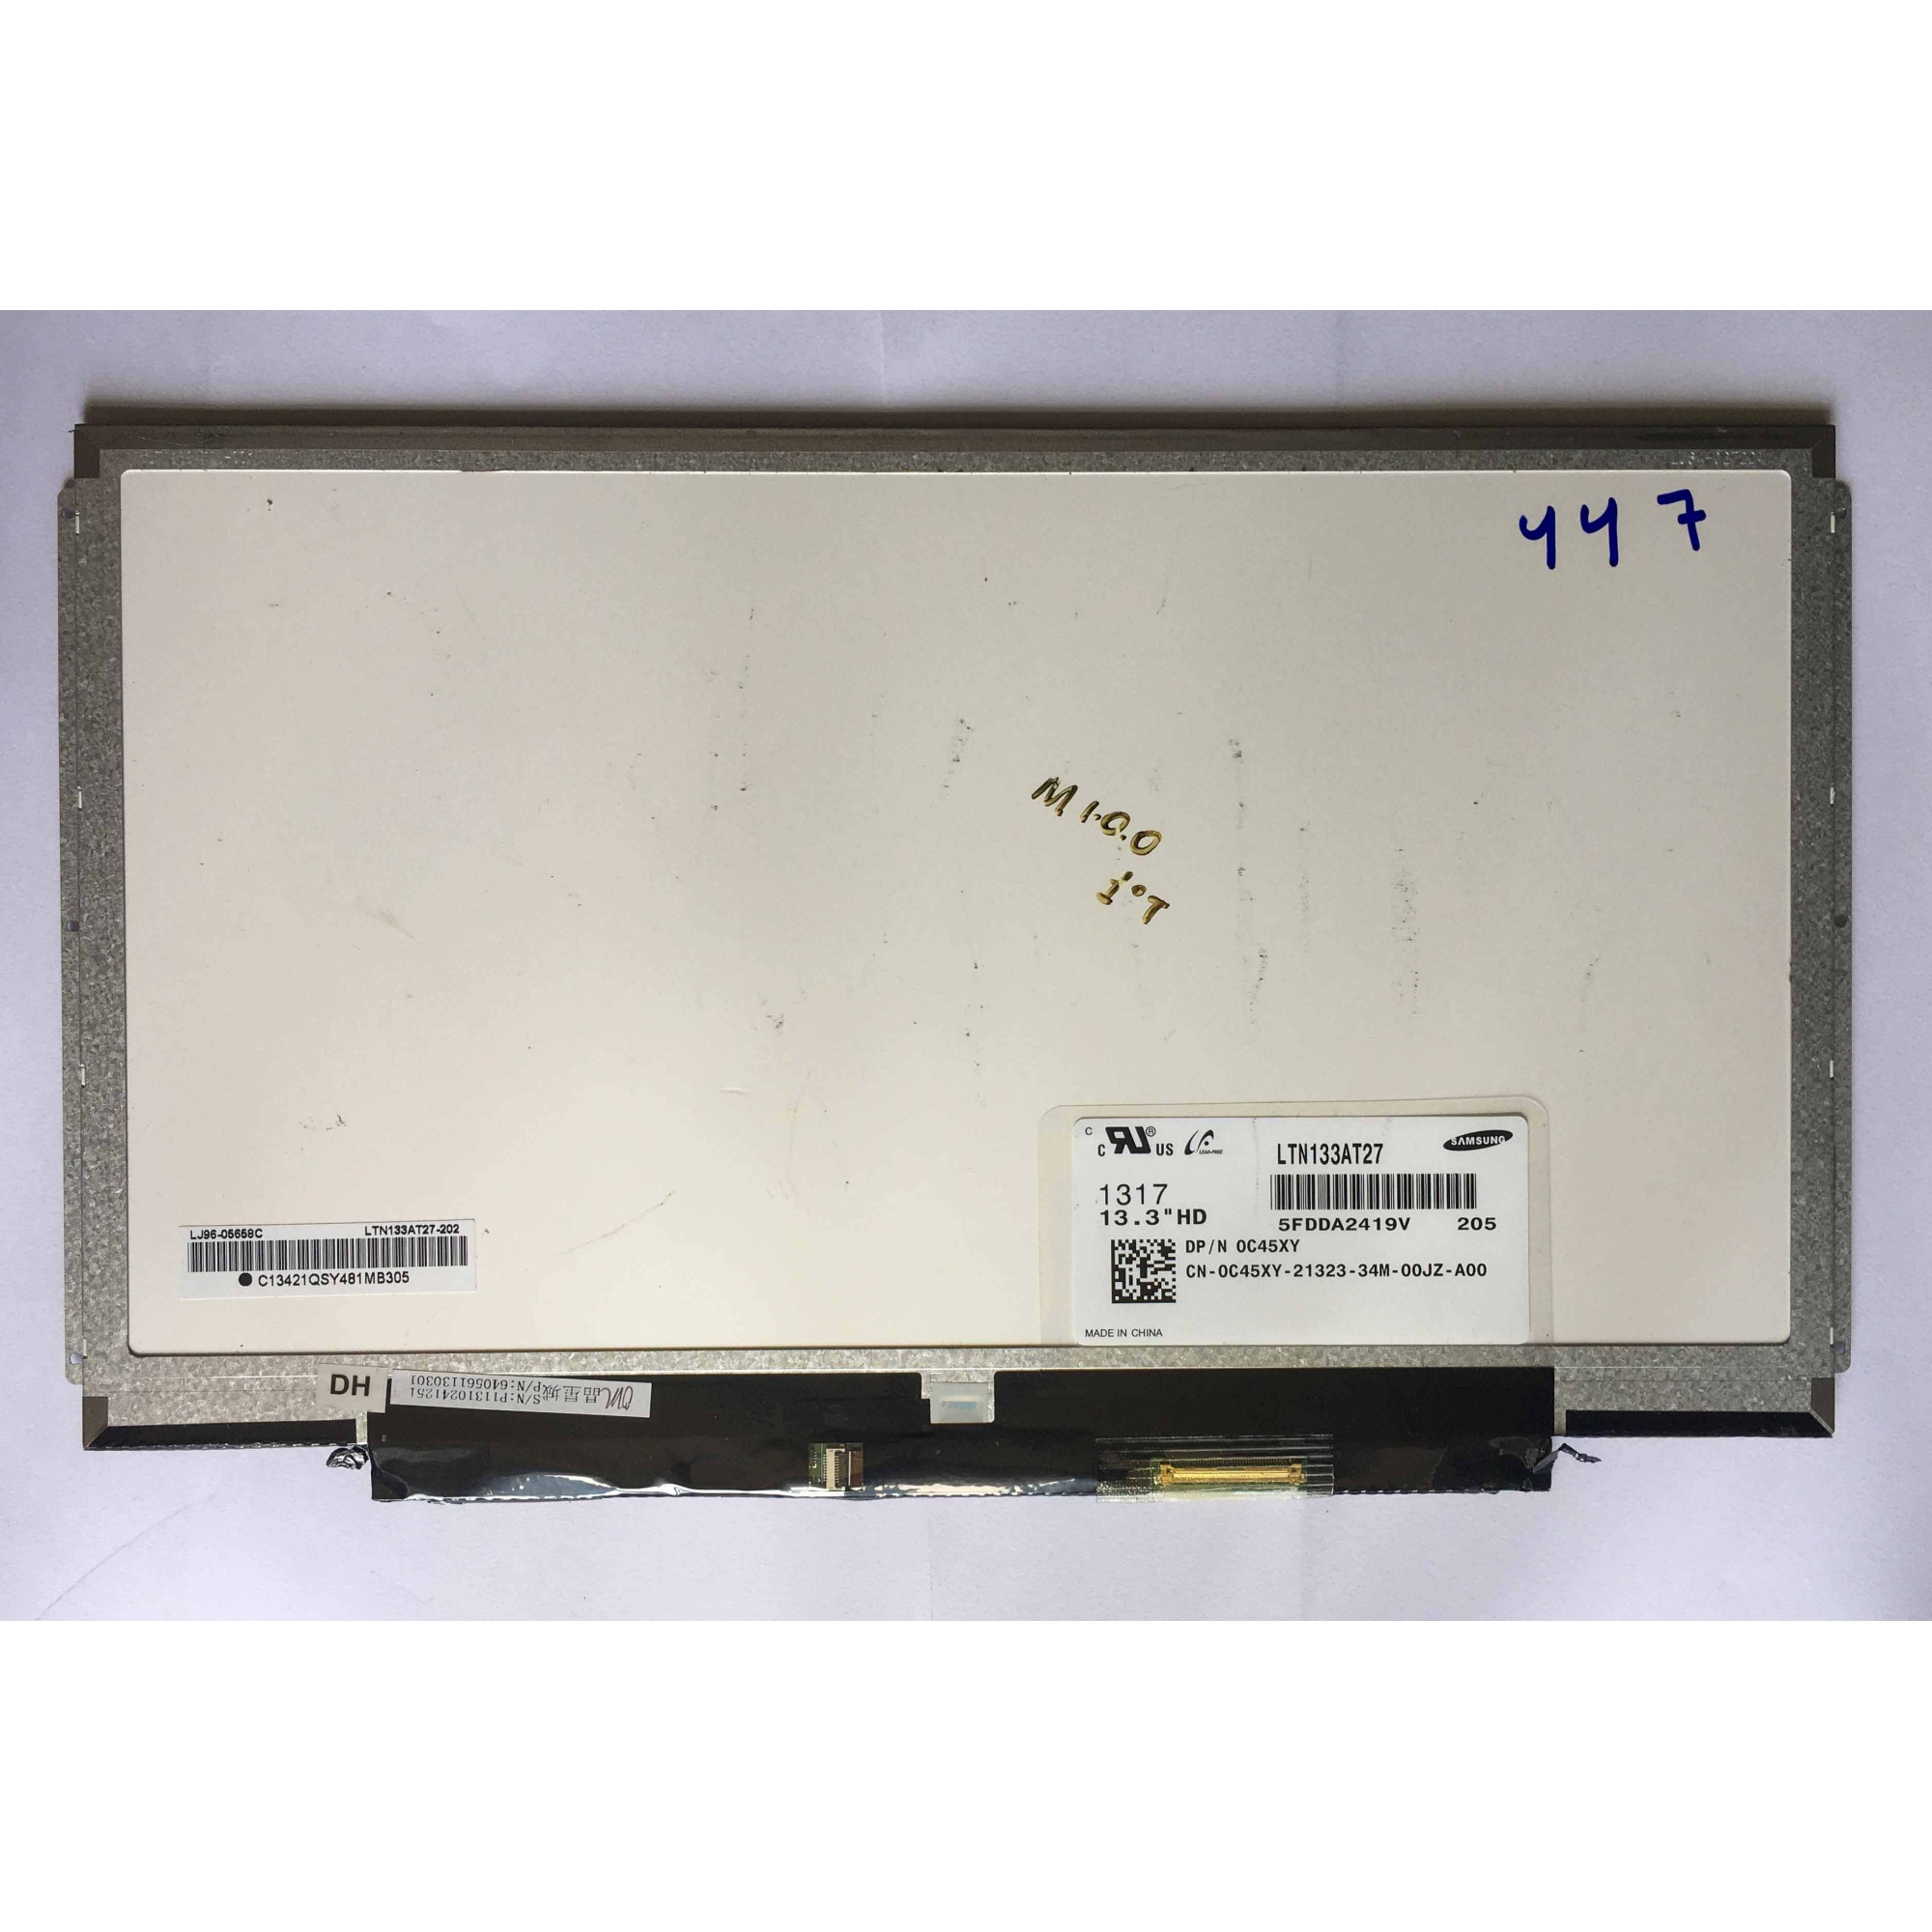 Tela 13.3 slim 40 pinos LTN133AT27 usada